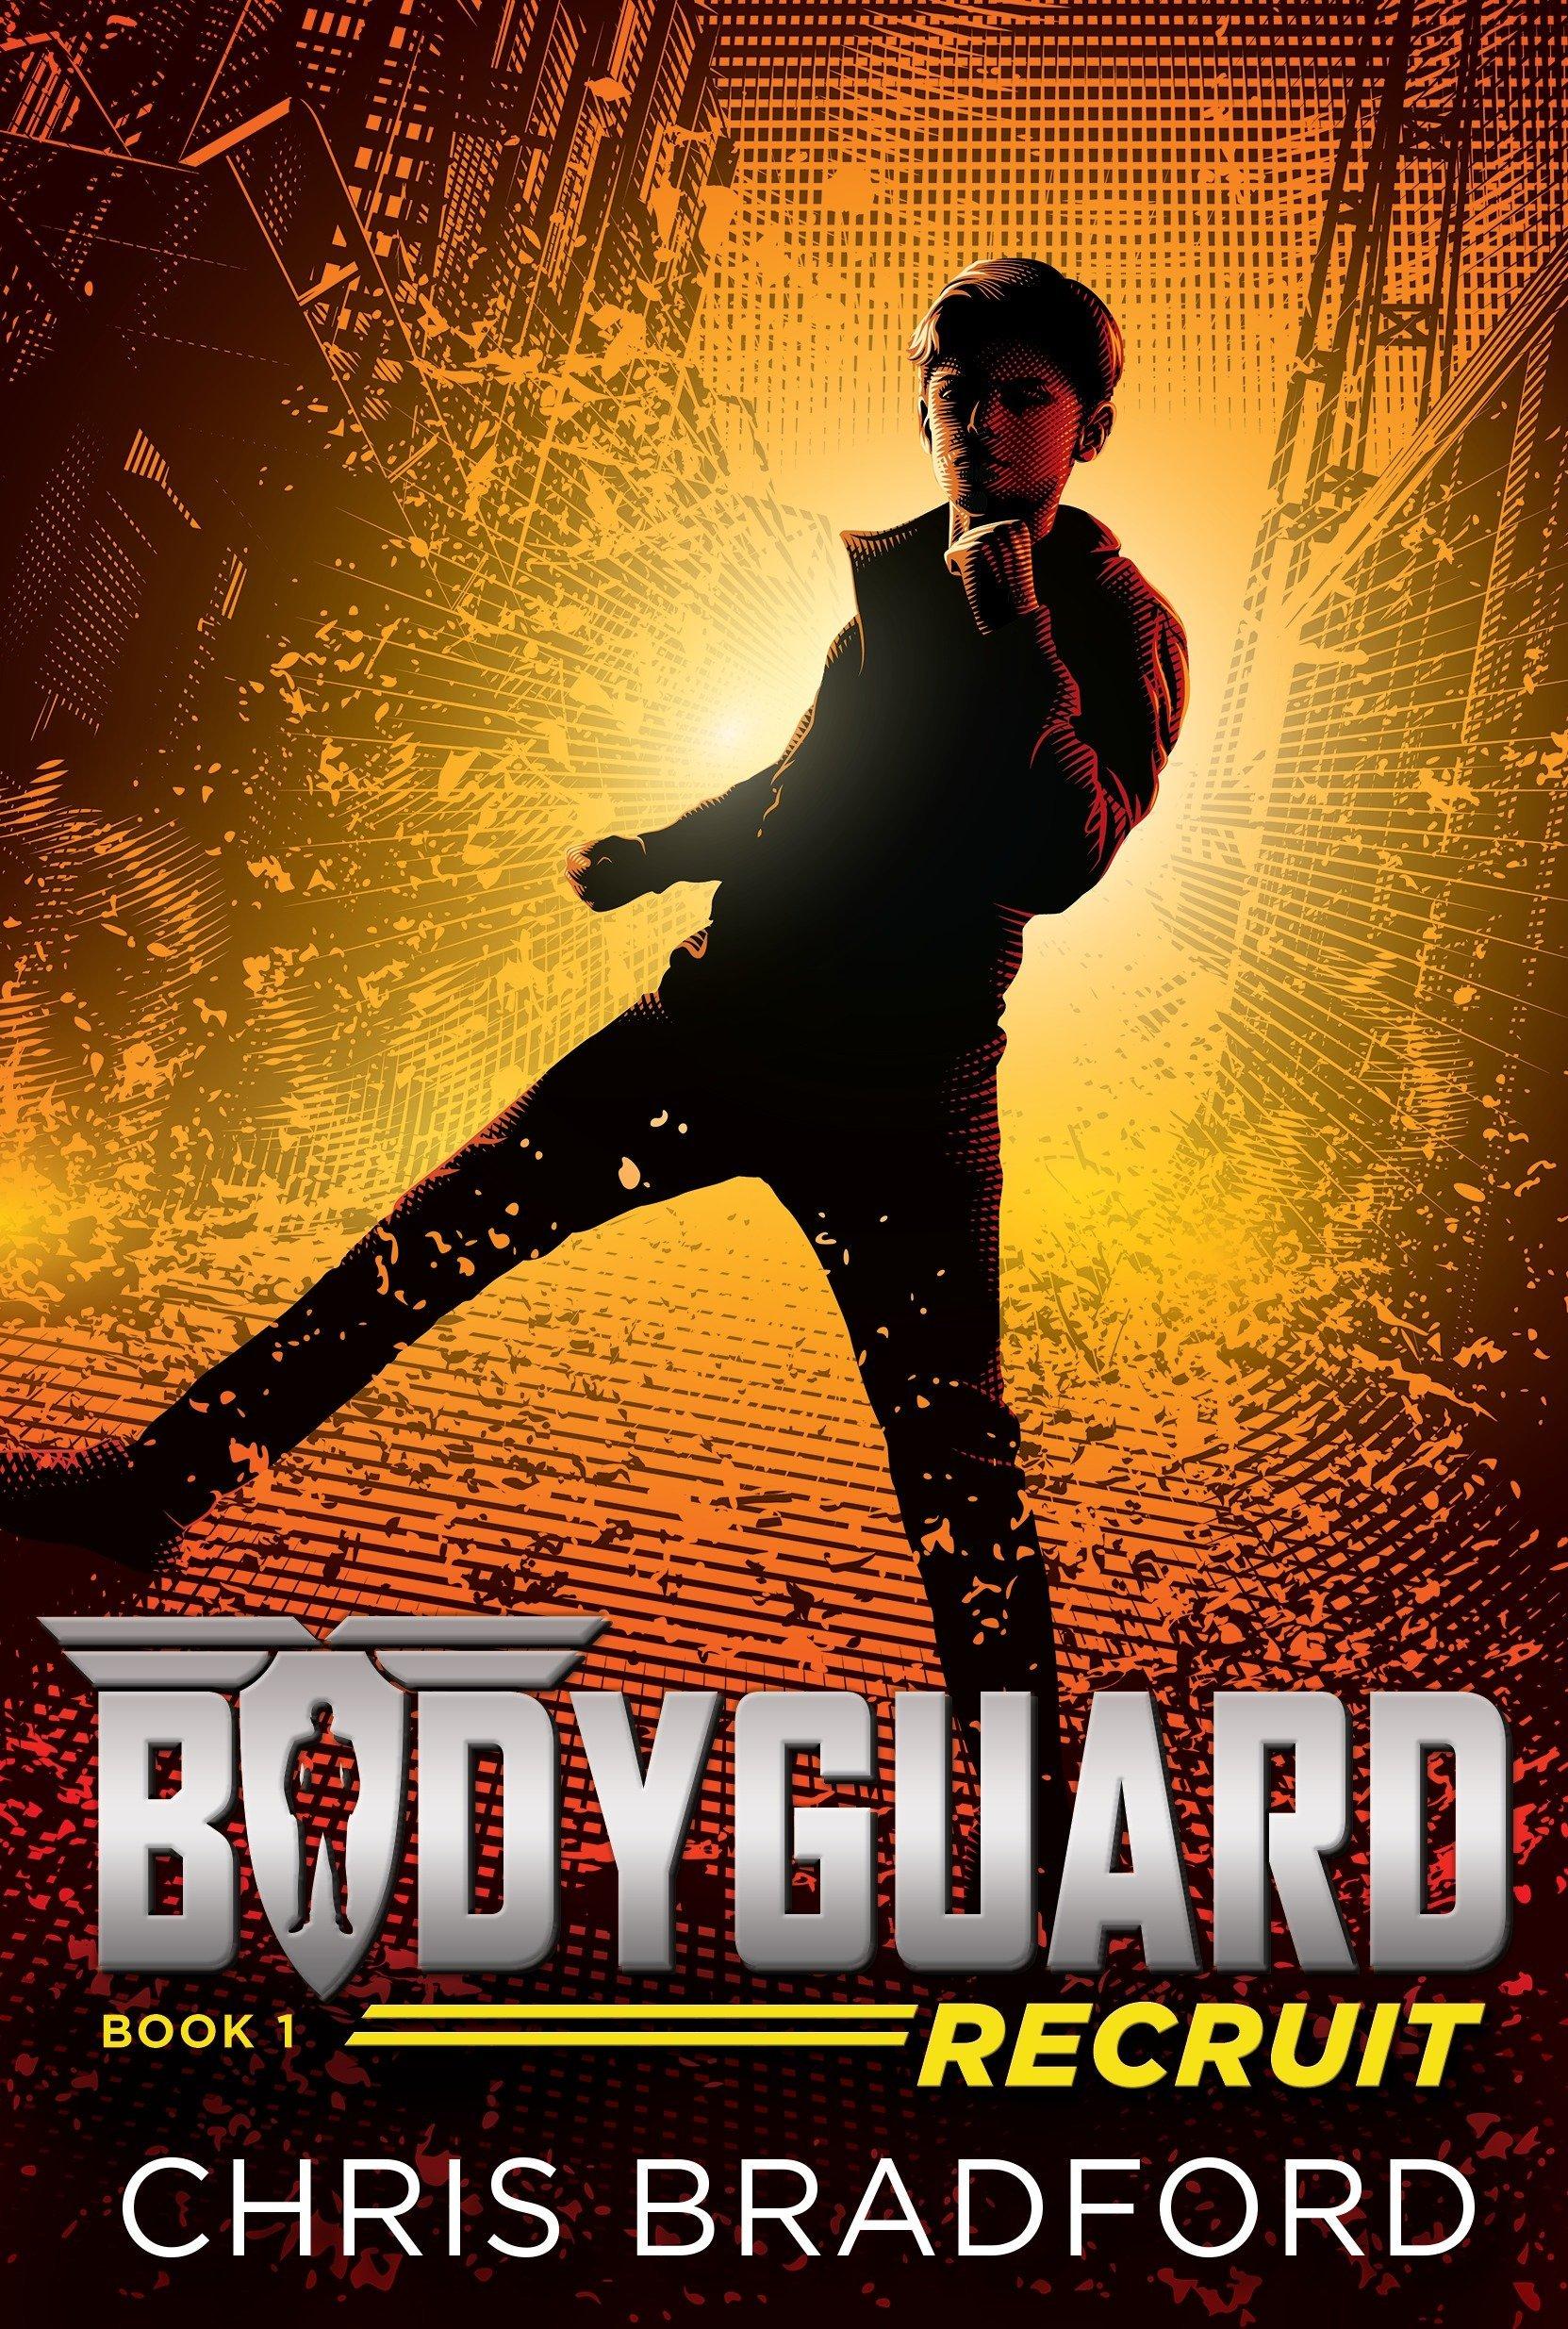 Bodyguard: Recruit (Book 1): Amazon.co.uk: Chris Bradford ...